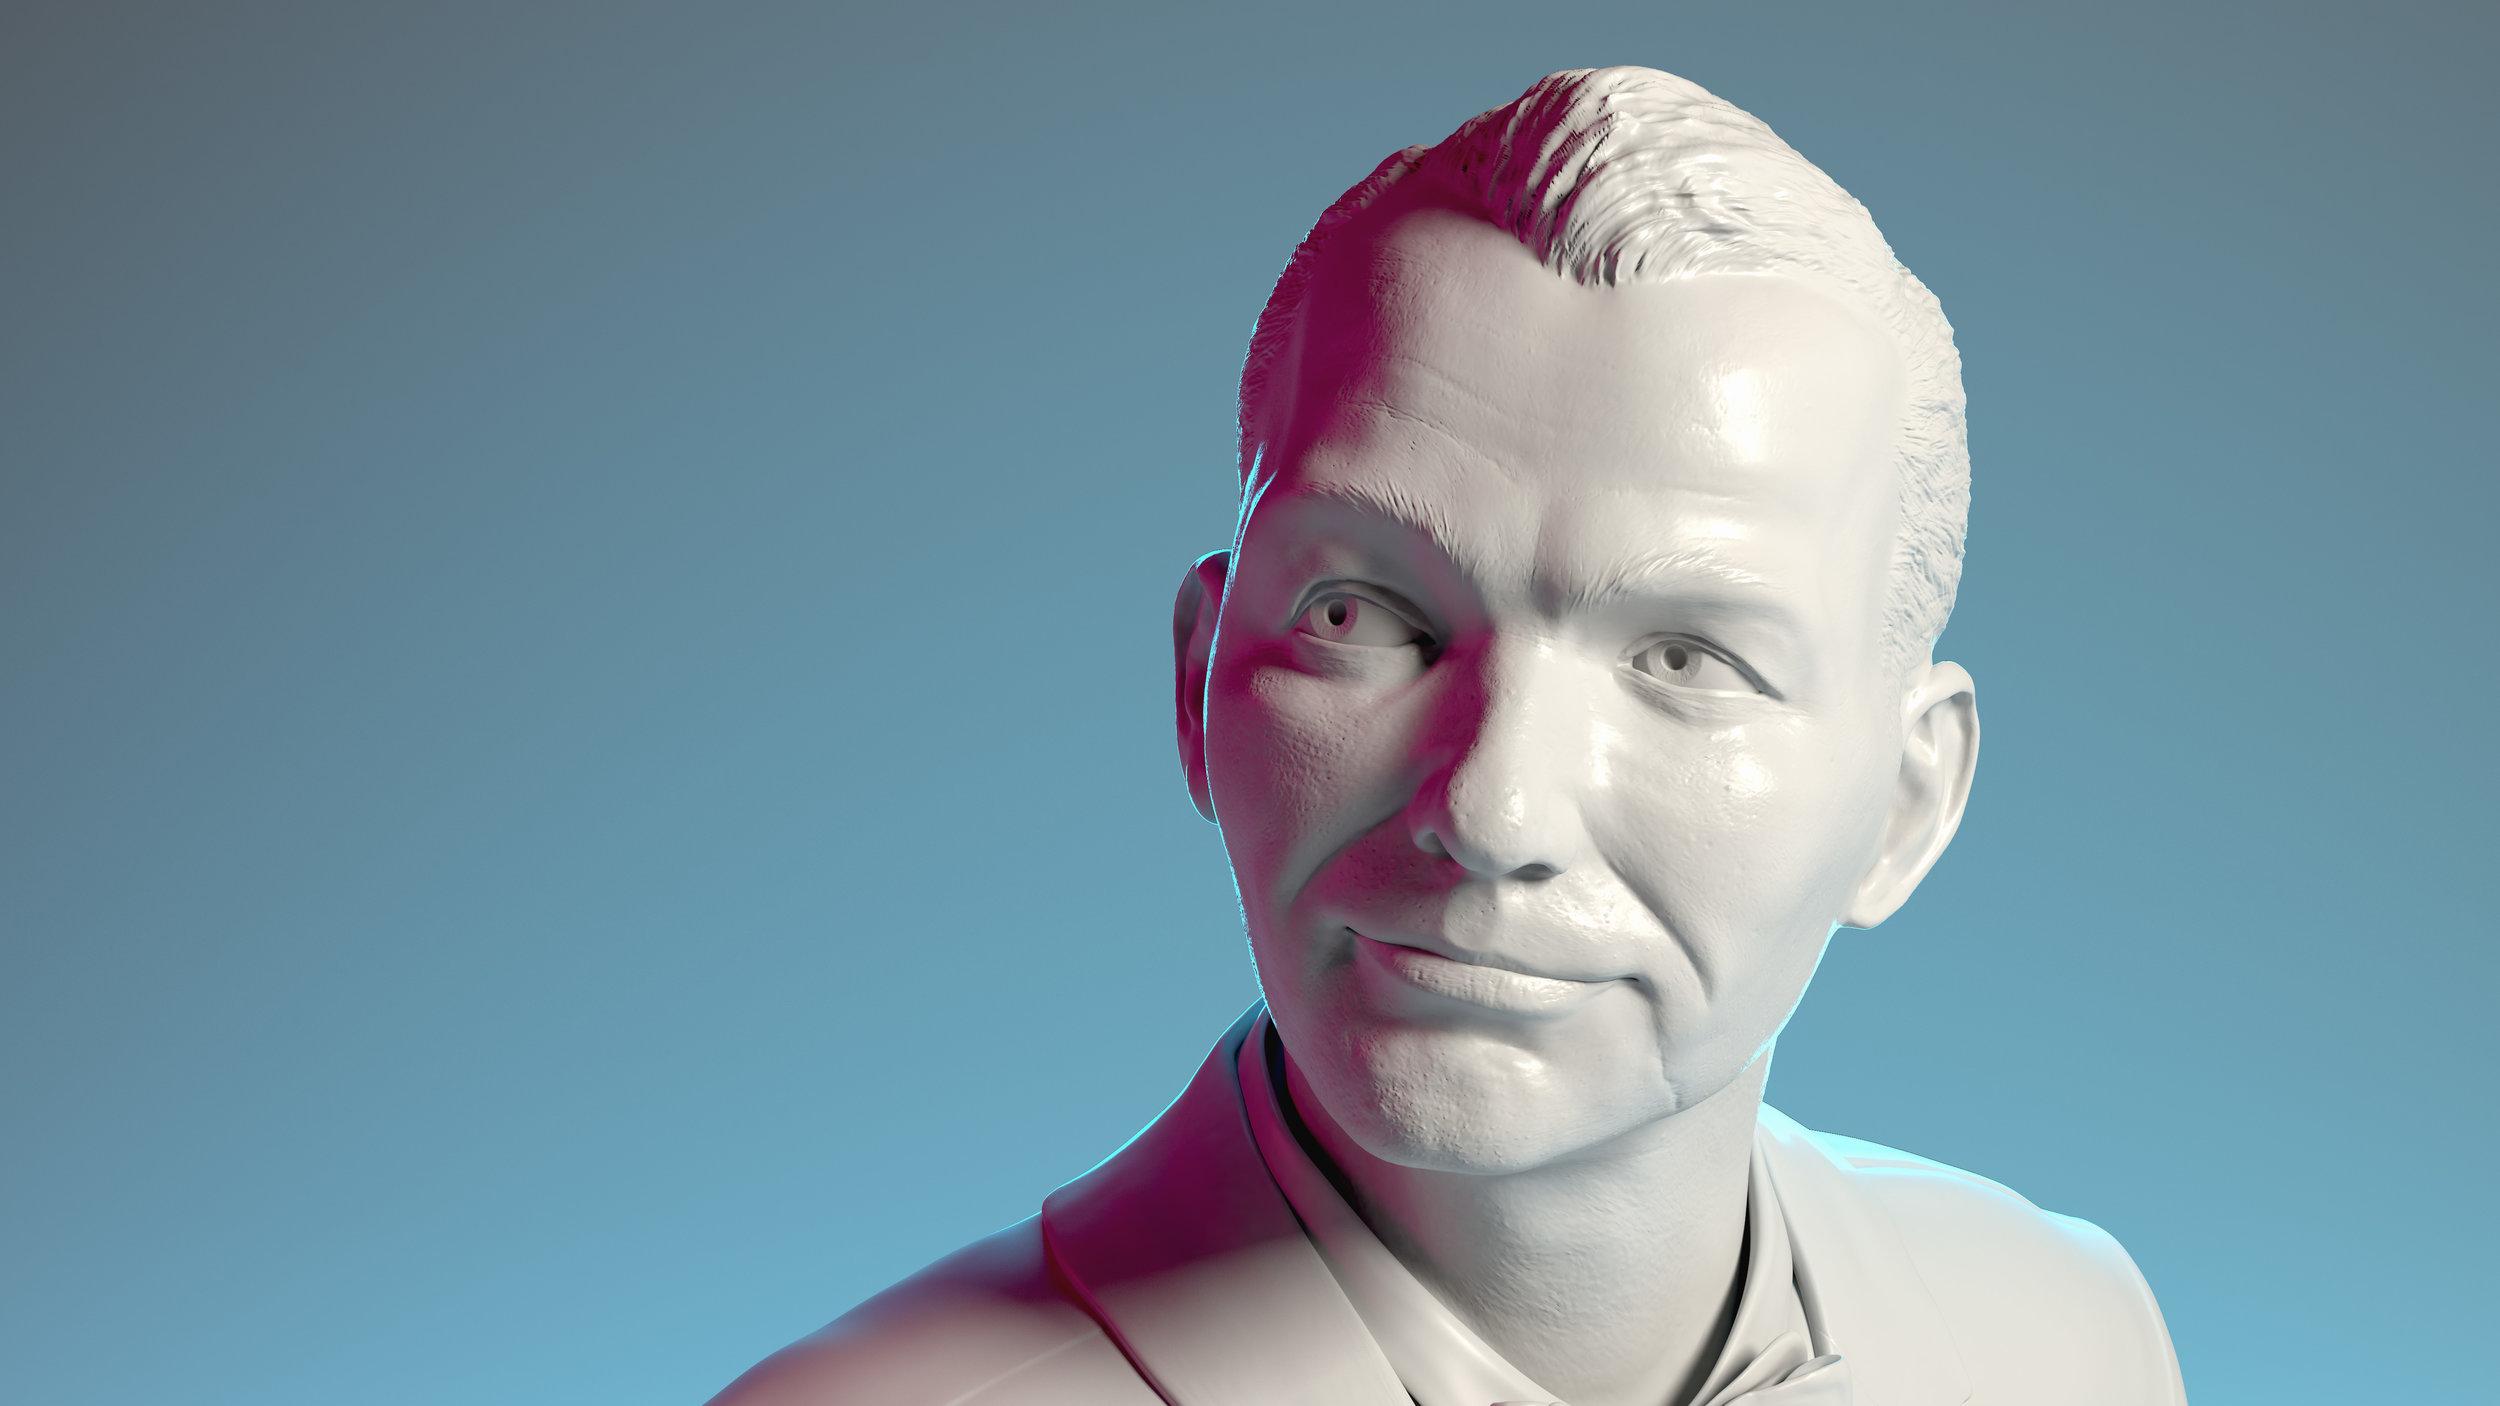 Modeling and digital sculpting